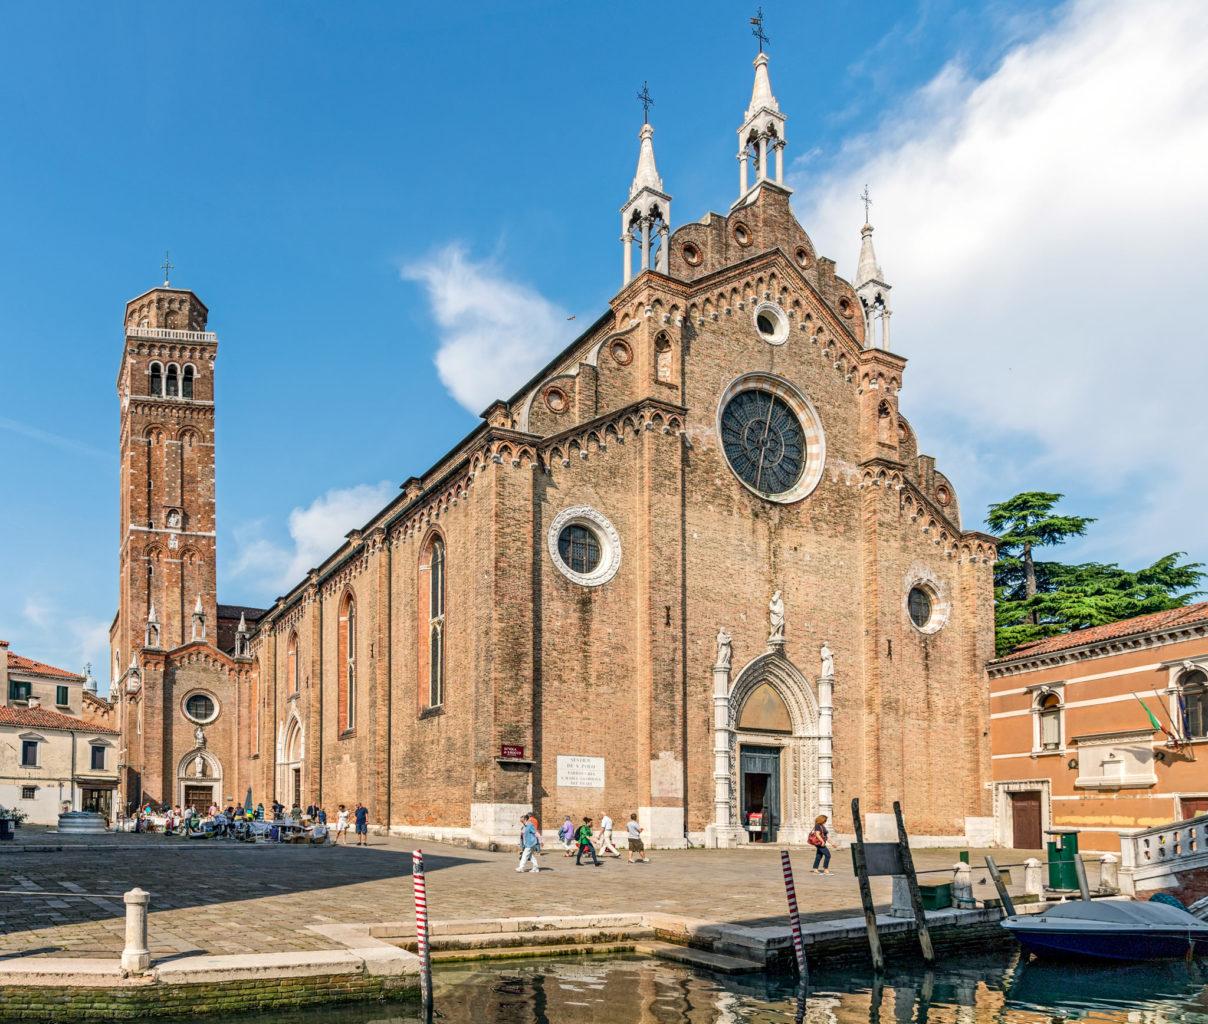 Санта-Мария-Глориоза-деи-Фрари(Chiesa Santa Maria Gloriosa dei Frari)